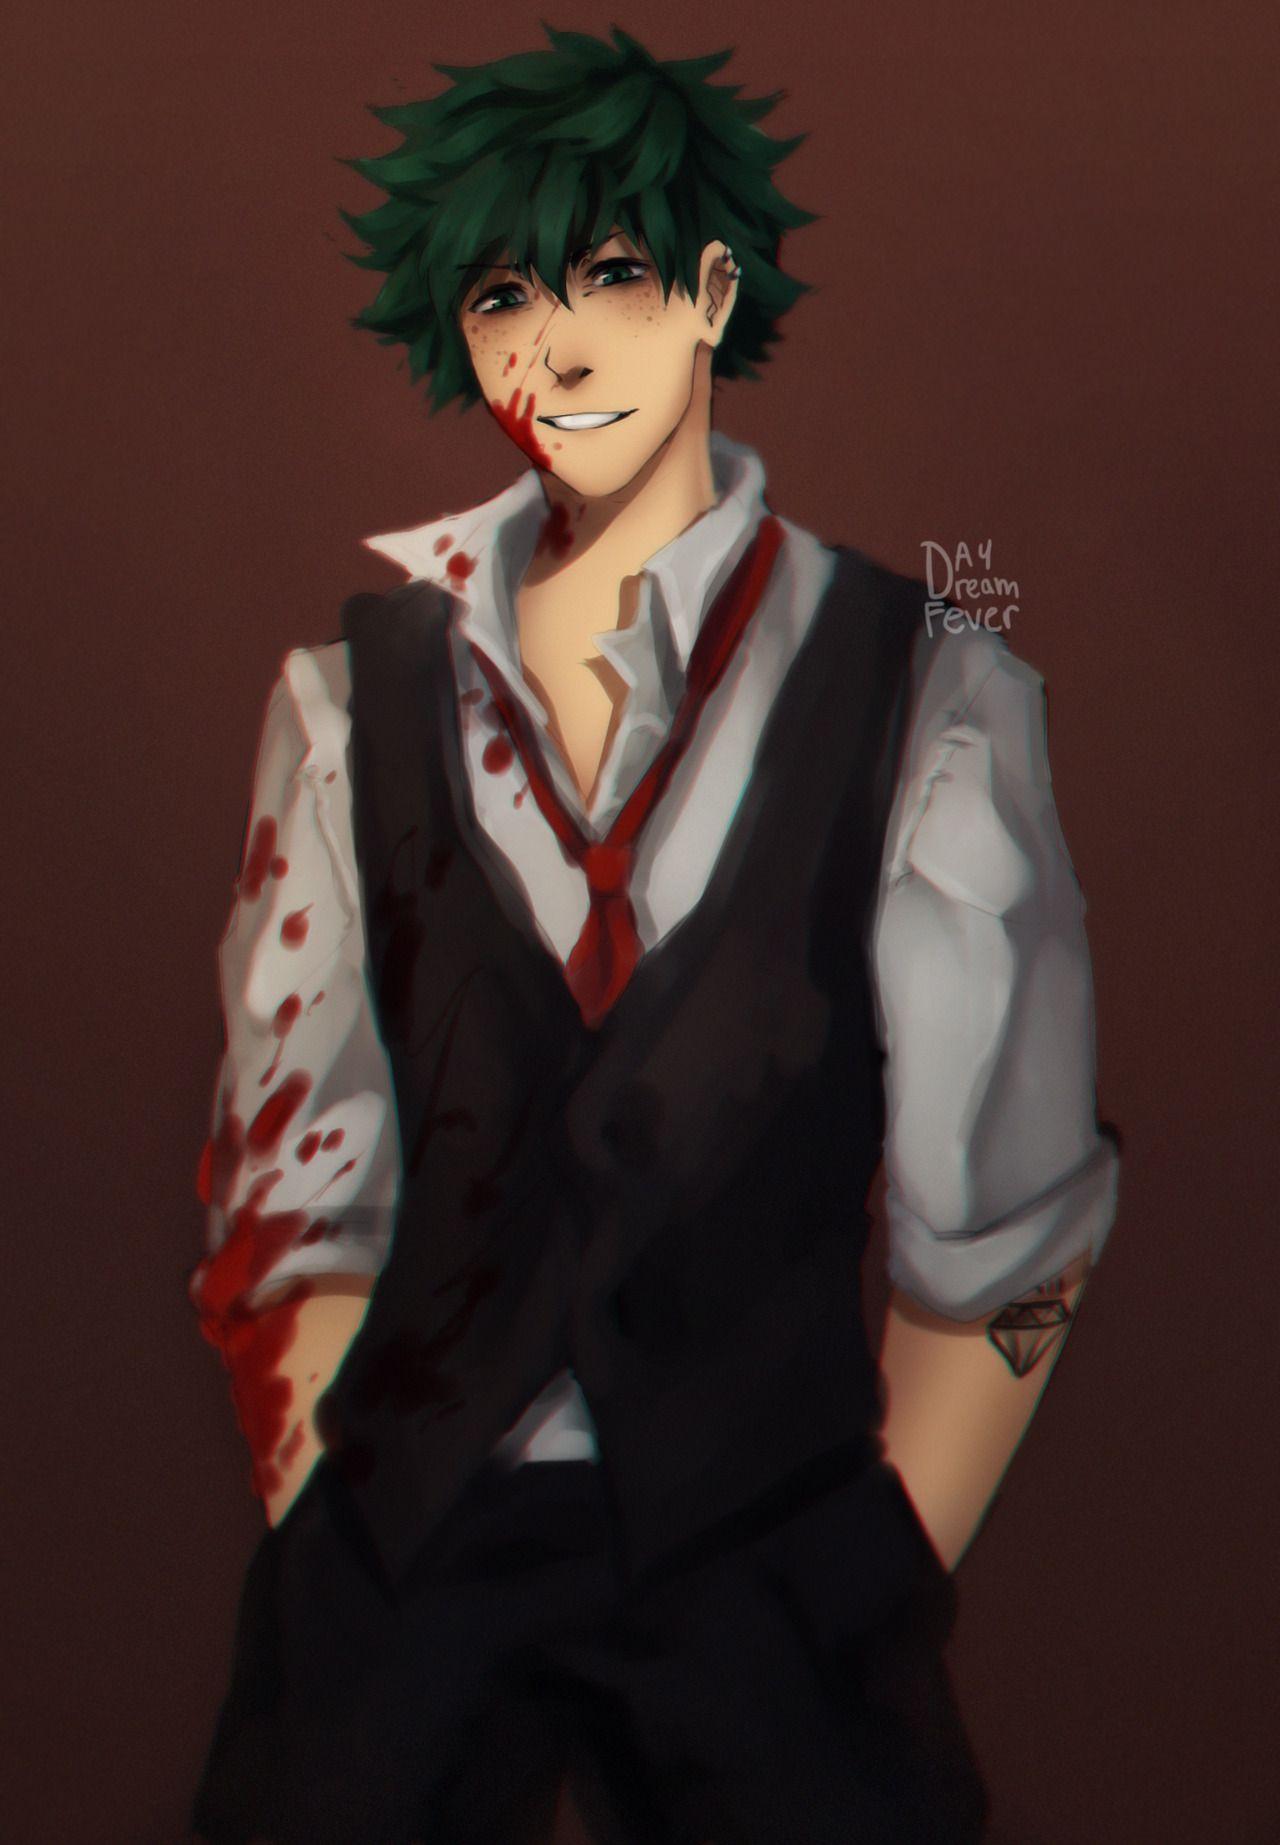 Izuku Midoriya Mafia Boss Villain Villain Deku My Hero